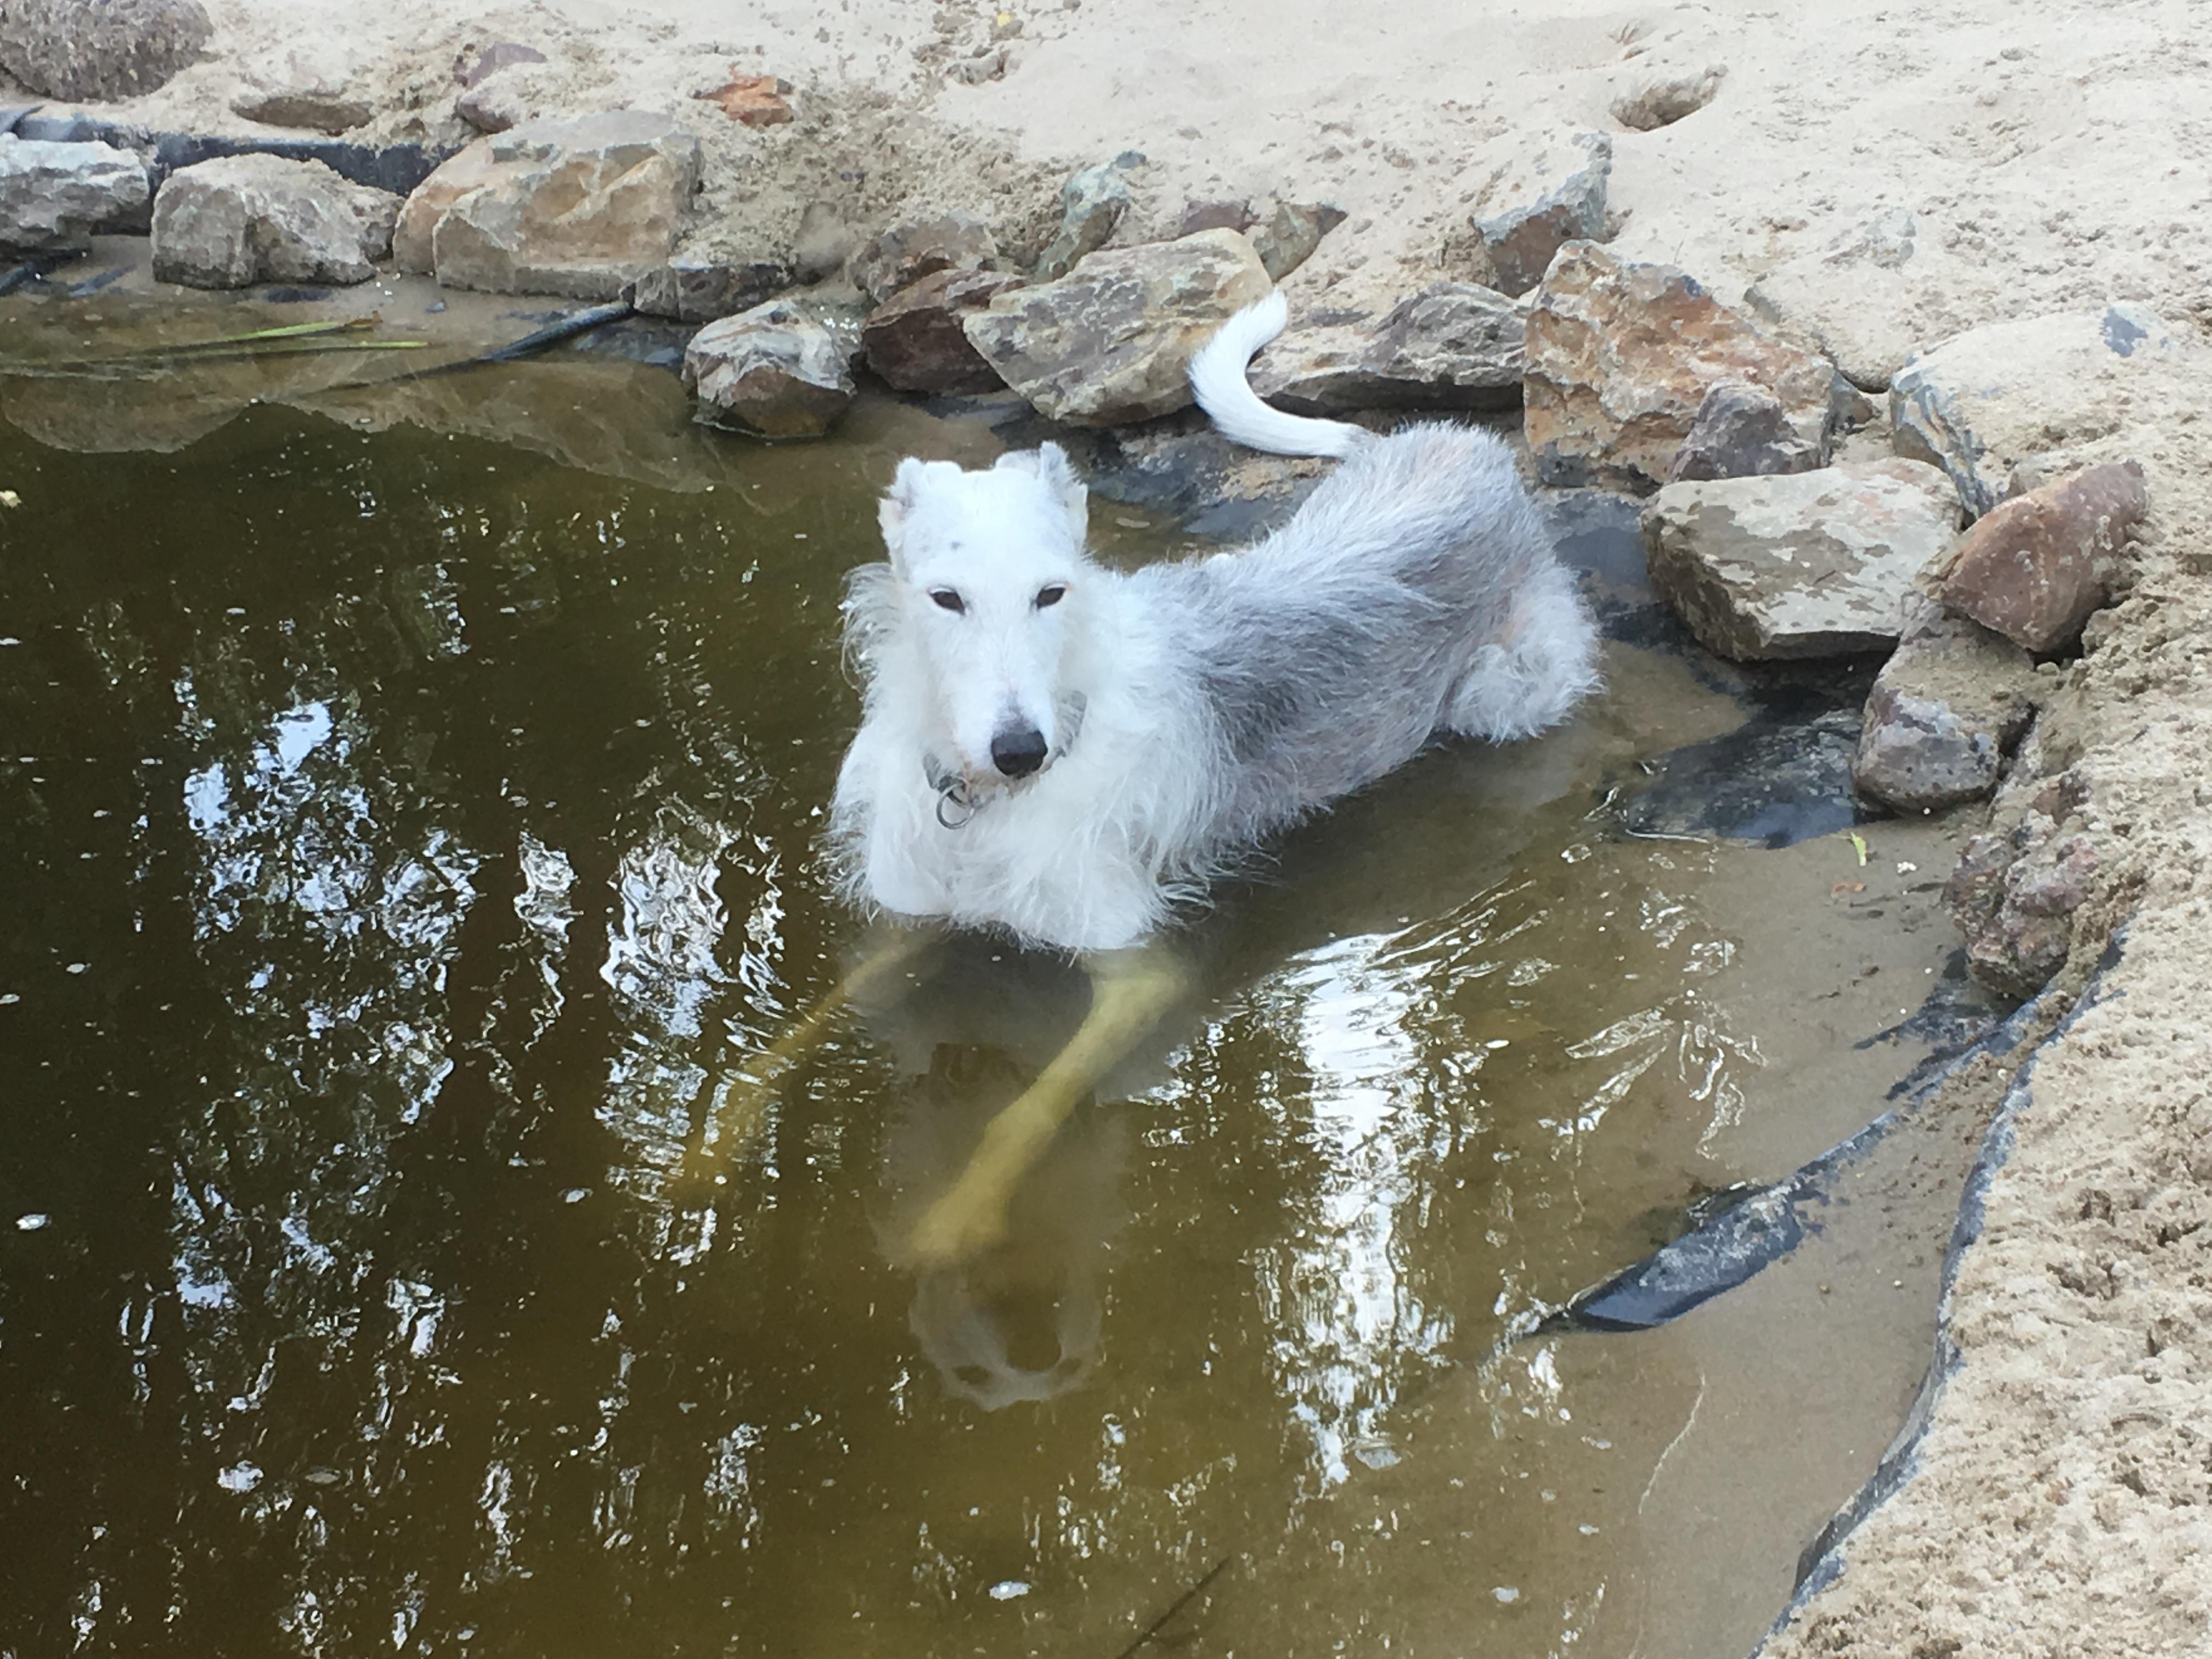 Hondenpension Hof Rosa Canina